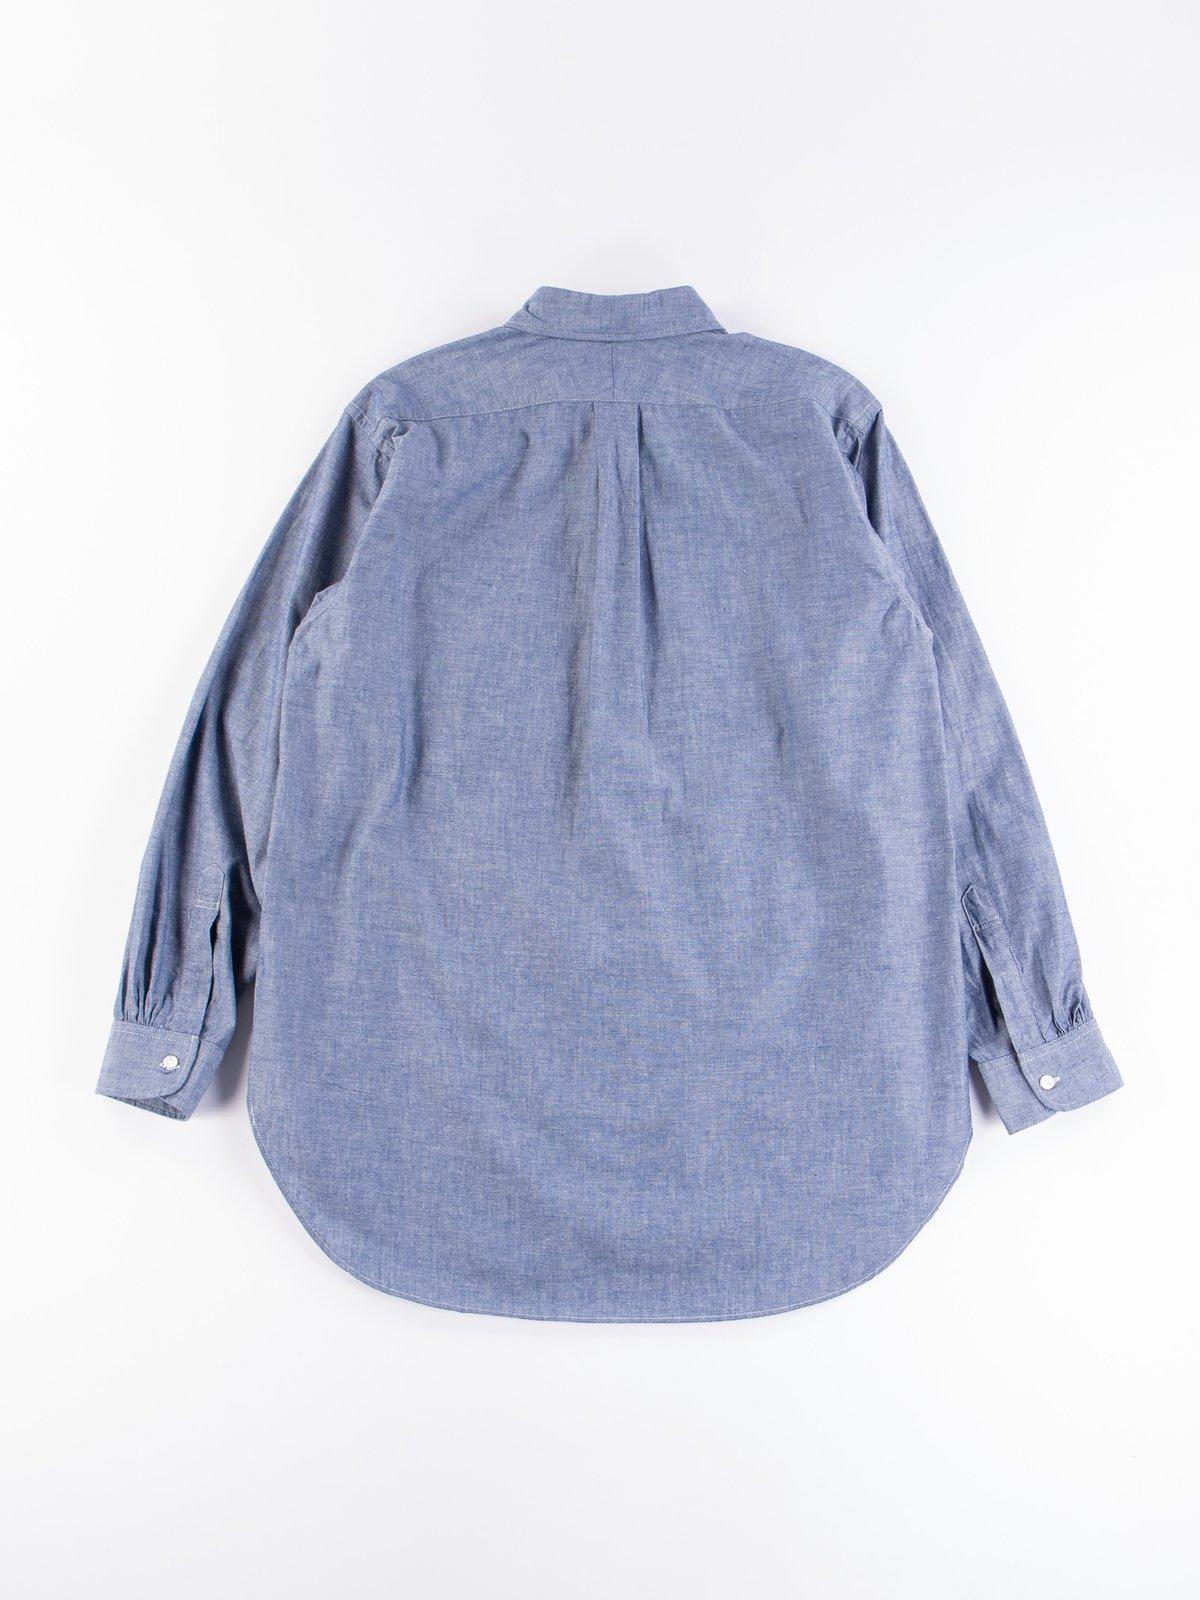 Blue Cotton Chambray 19th Century BD Shirt - Image 6